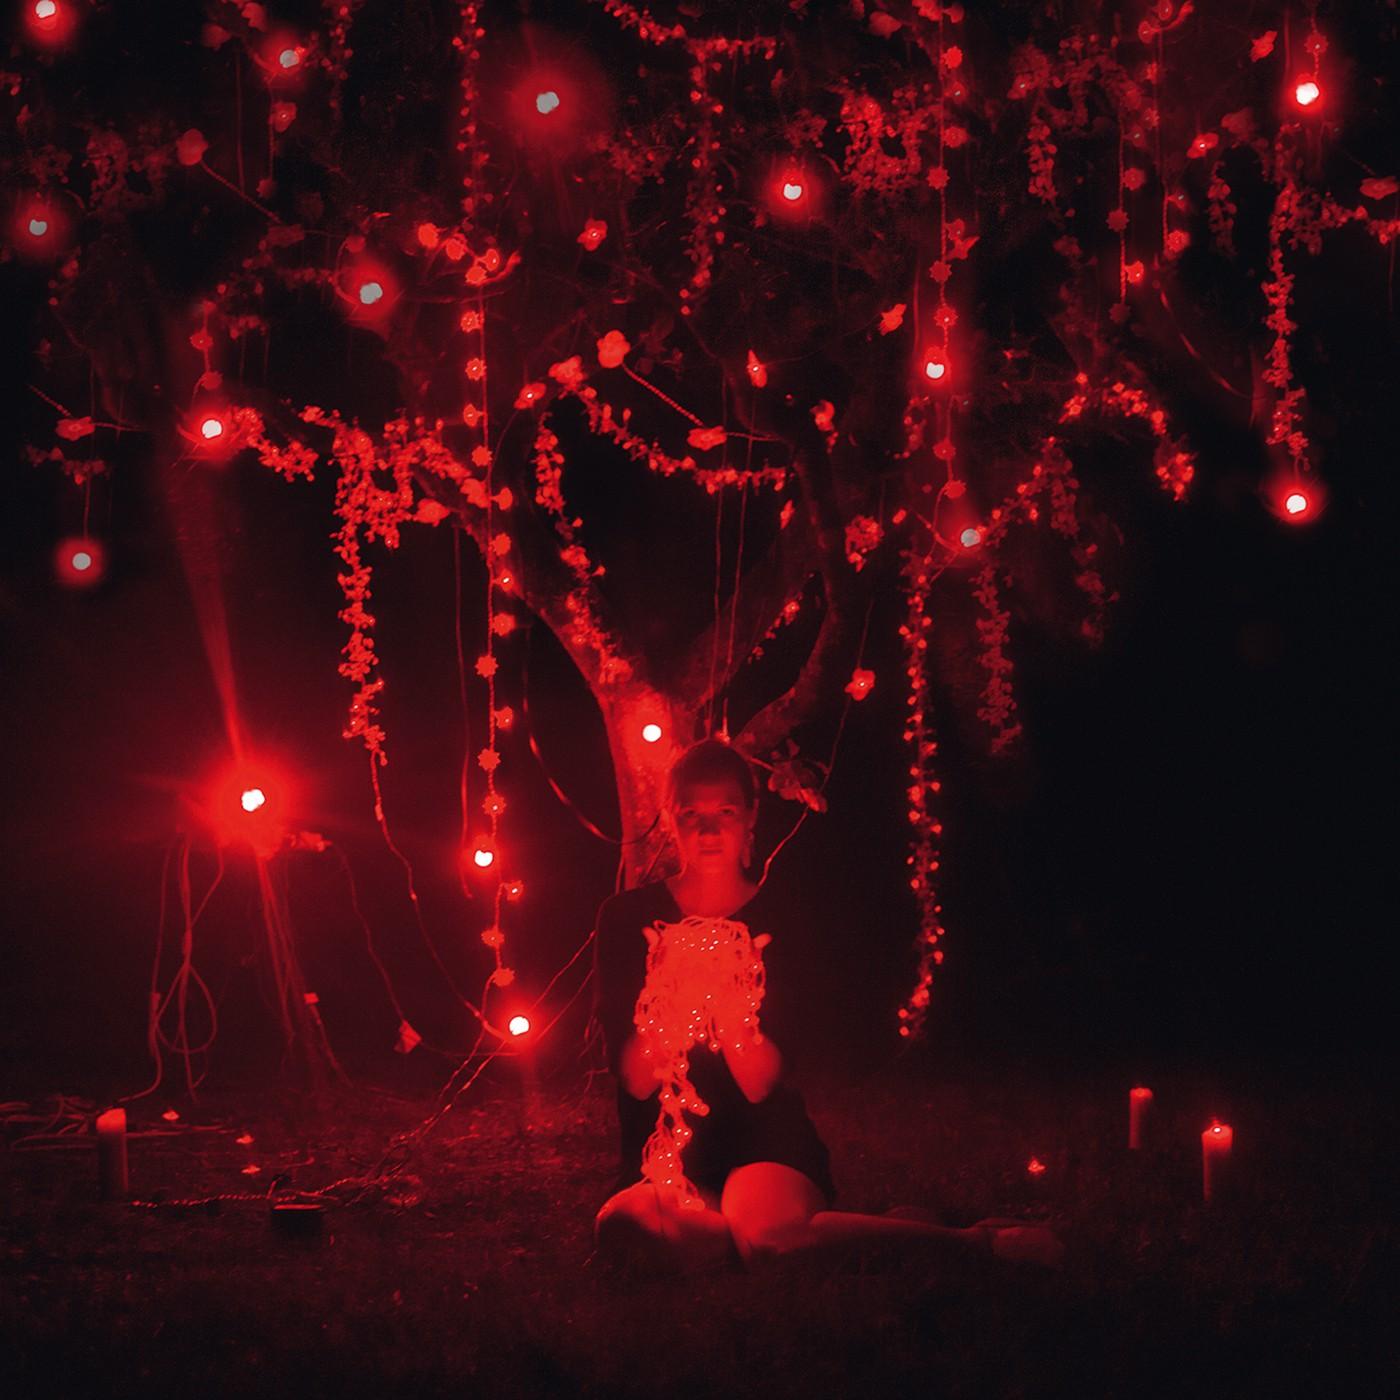 SOPHIE HUNGER – The Danger of Light (Deluxe Edition)